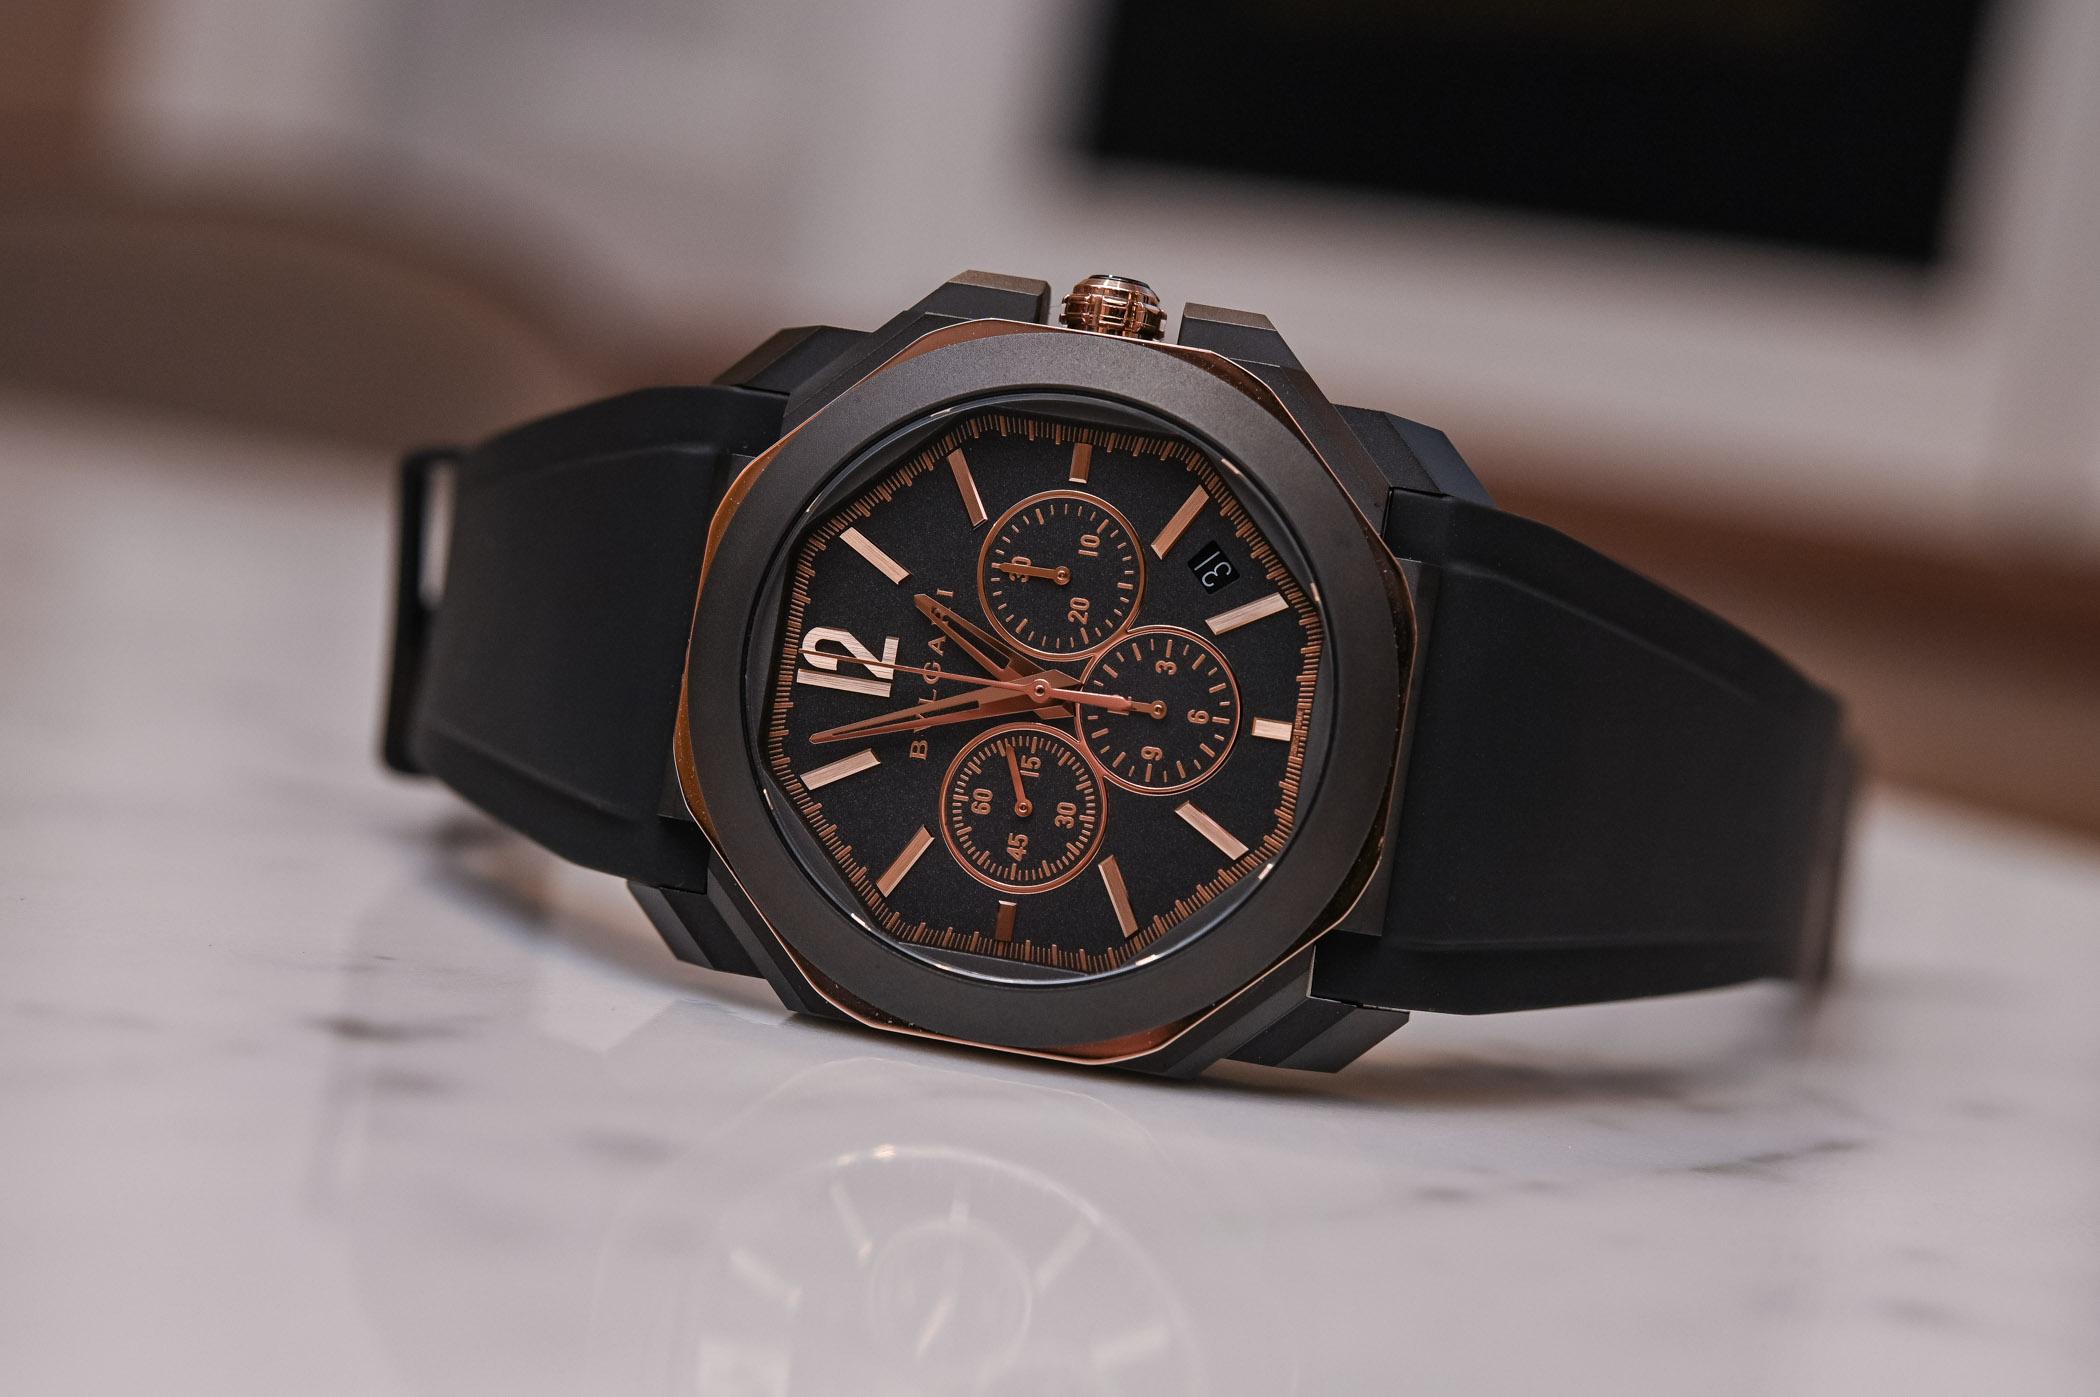 Bvlgari Octo L'Originale black-and-gold 2019 collection